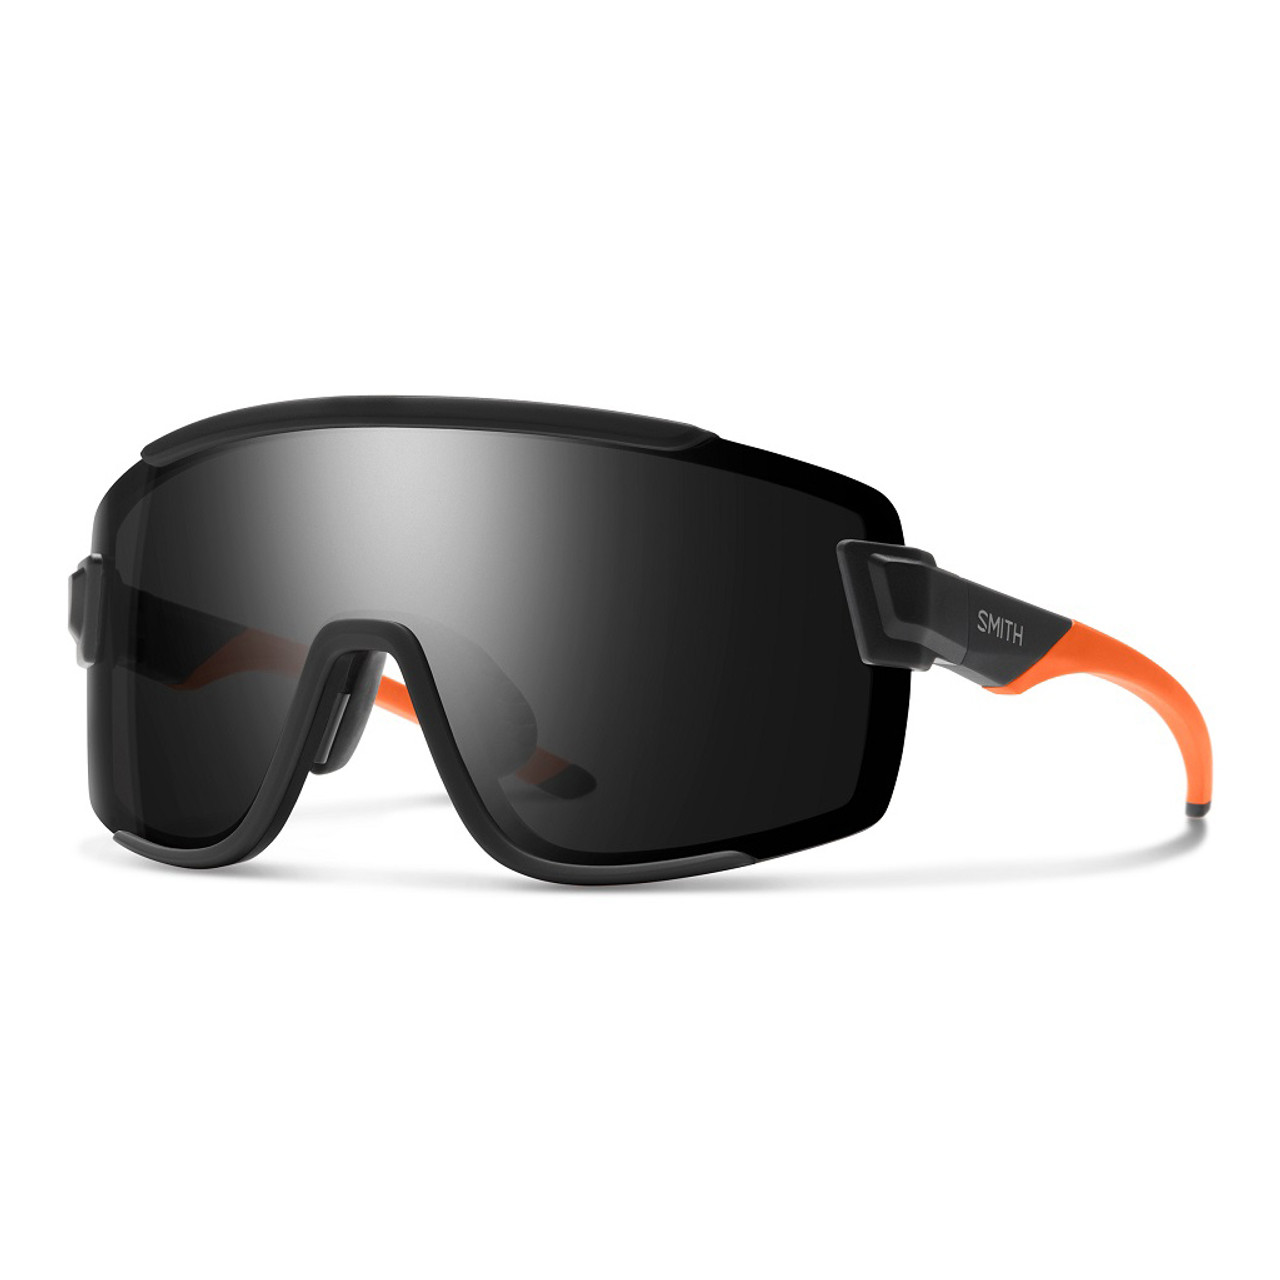 Black Cinder w/ Chromapop Black - Smith Wildcat Sunglasses